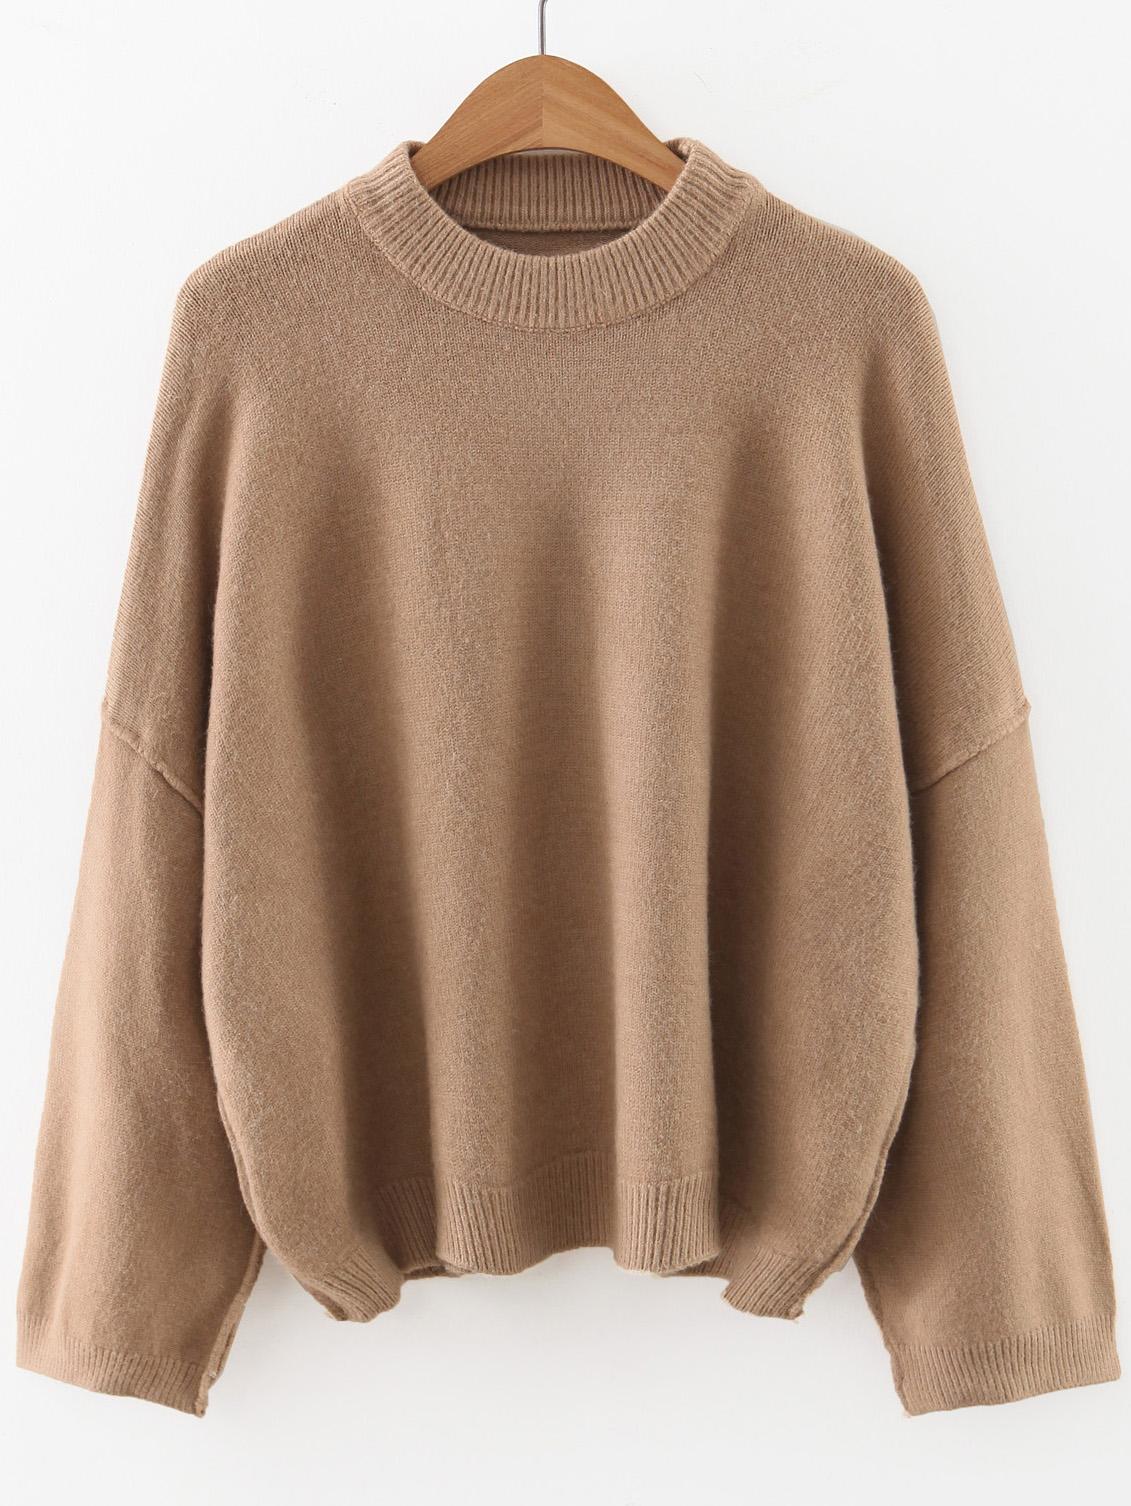 Khaki Crew Neck Drop Shoulder Sweater sweater160923206